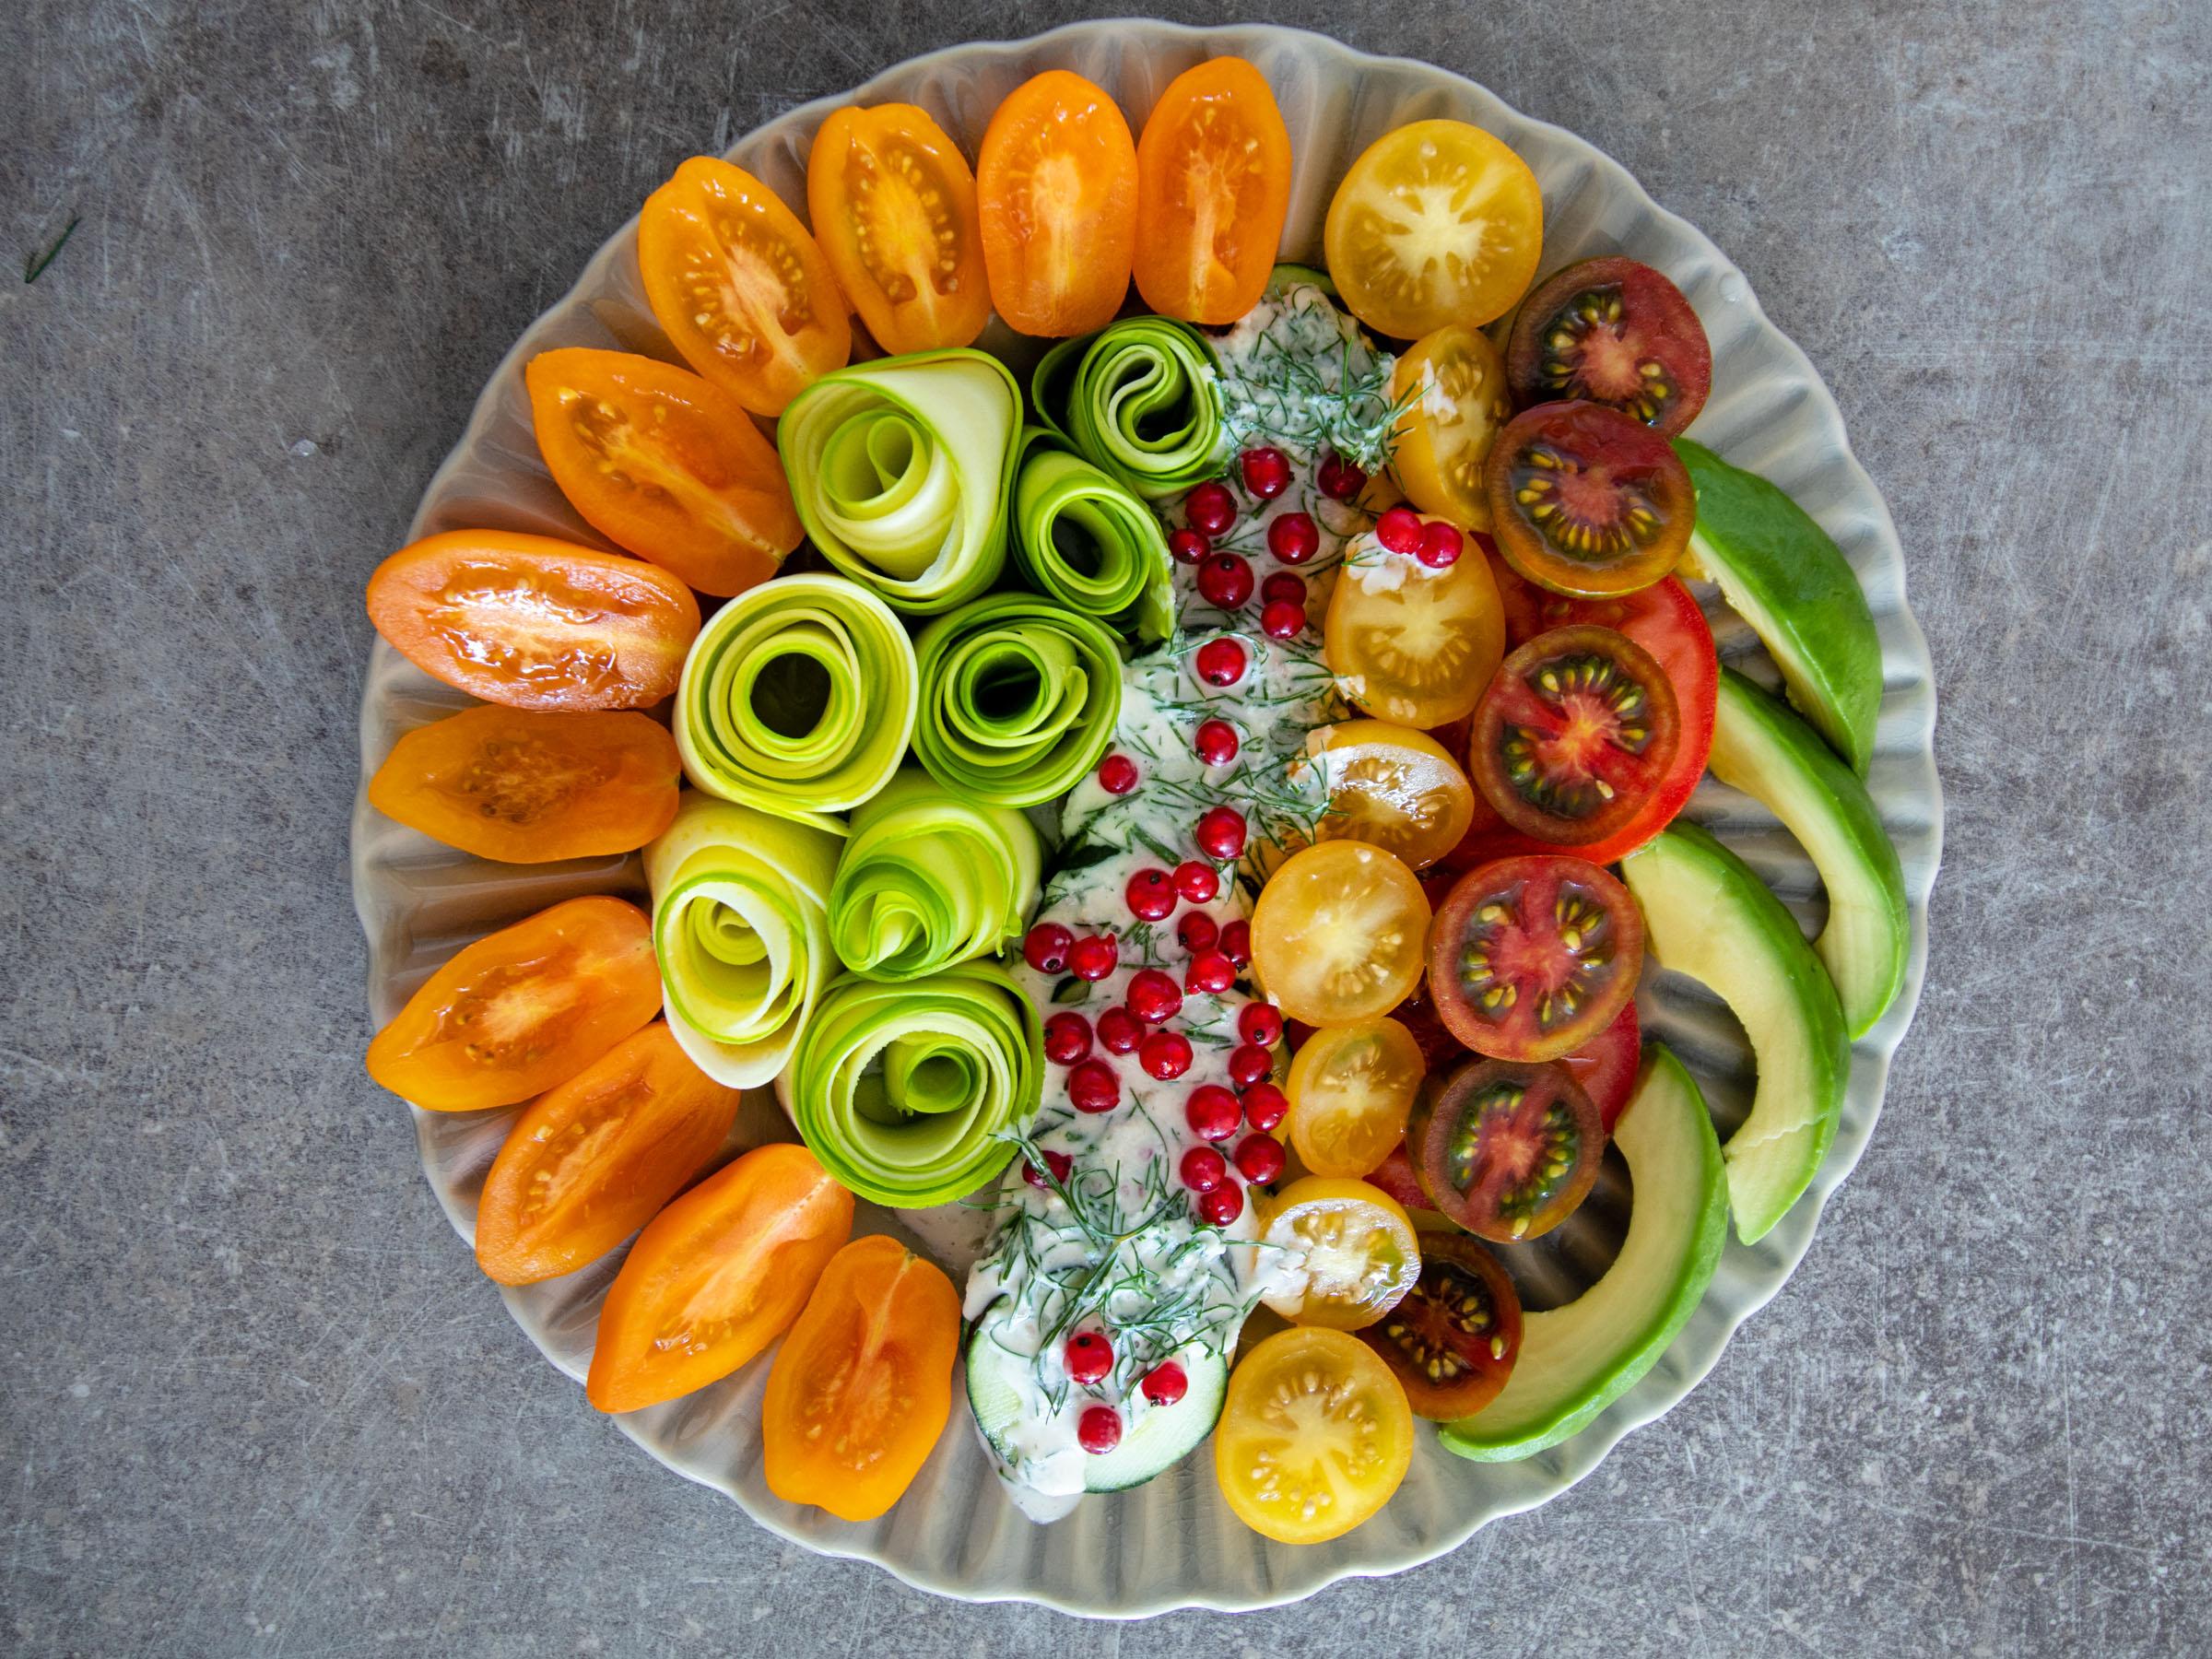 Tomato salad with Tahini dressing